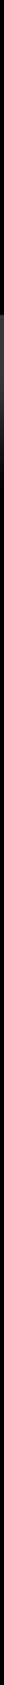 black_background_repeat5.jpg